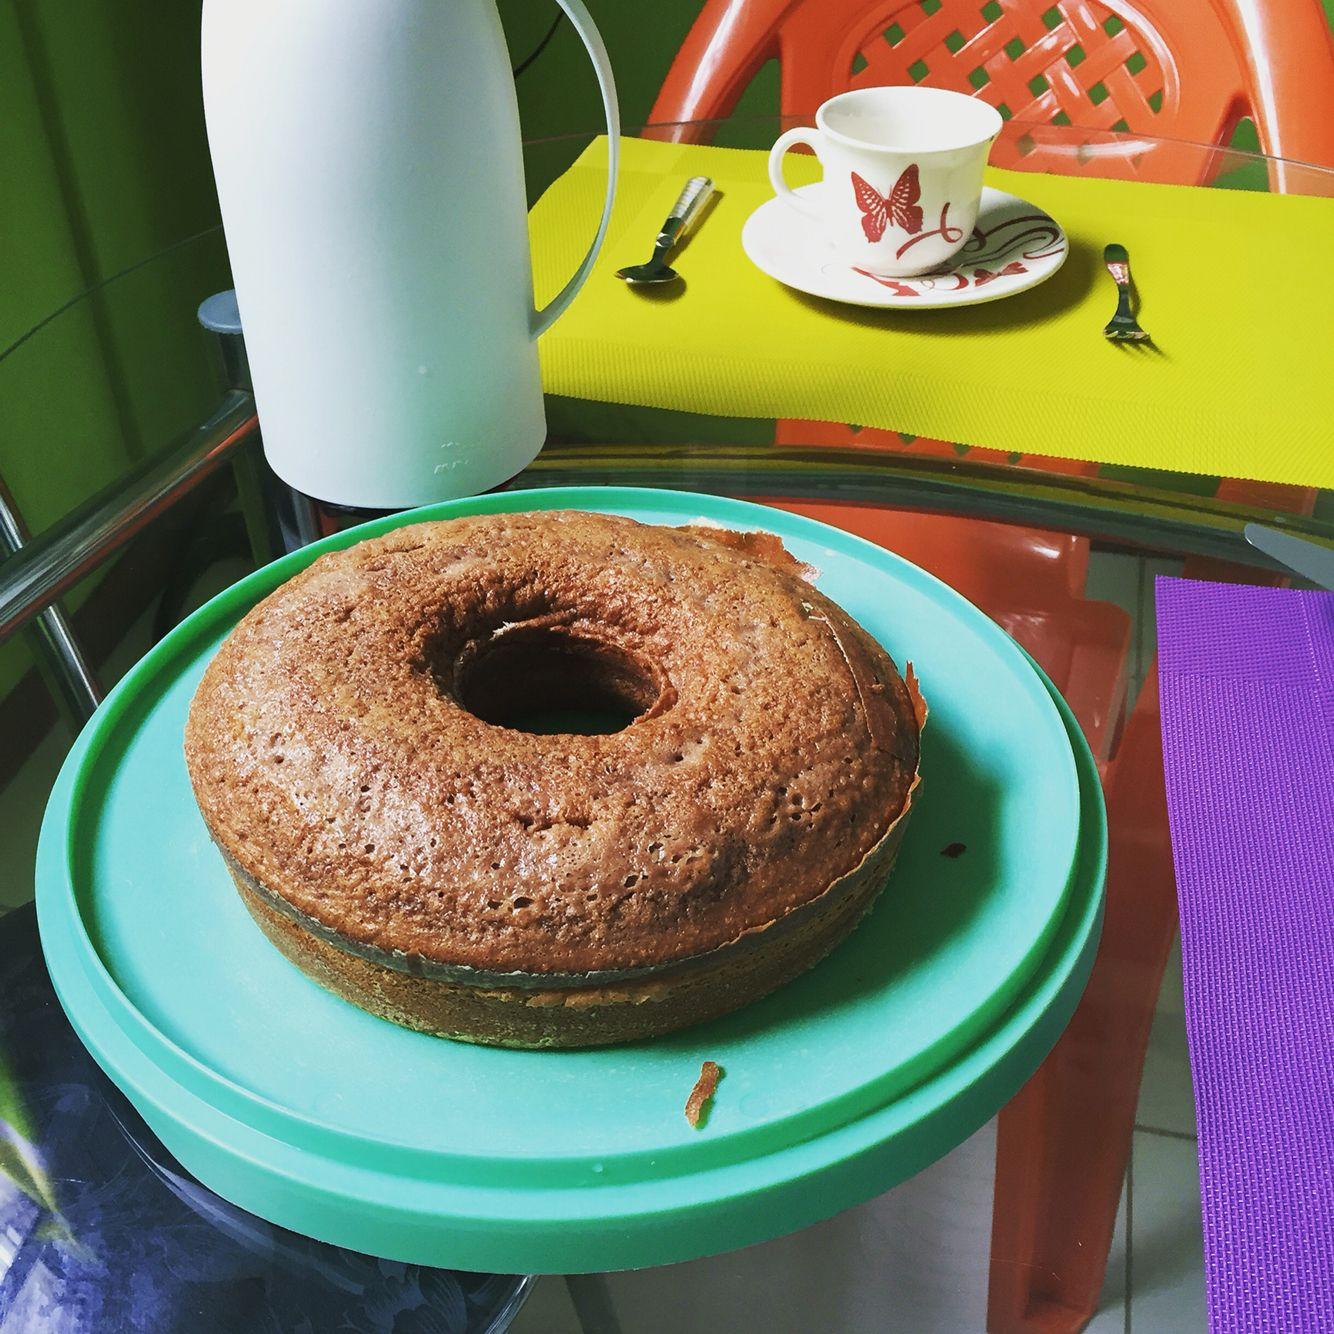 Bolo De Chocolate Ingredientes 1 1 2 Xicara De Leite 4 Colheres